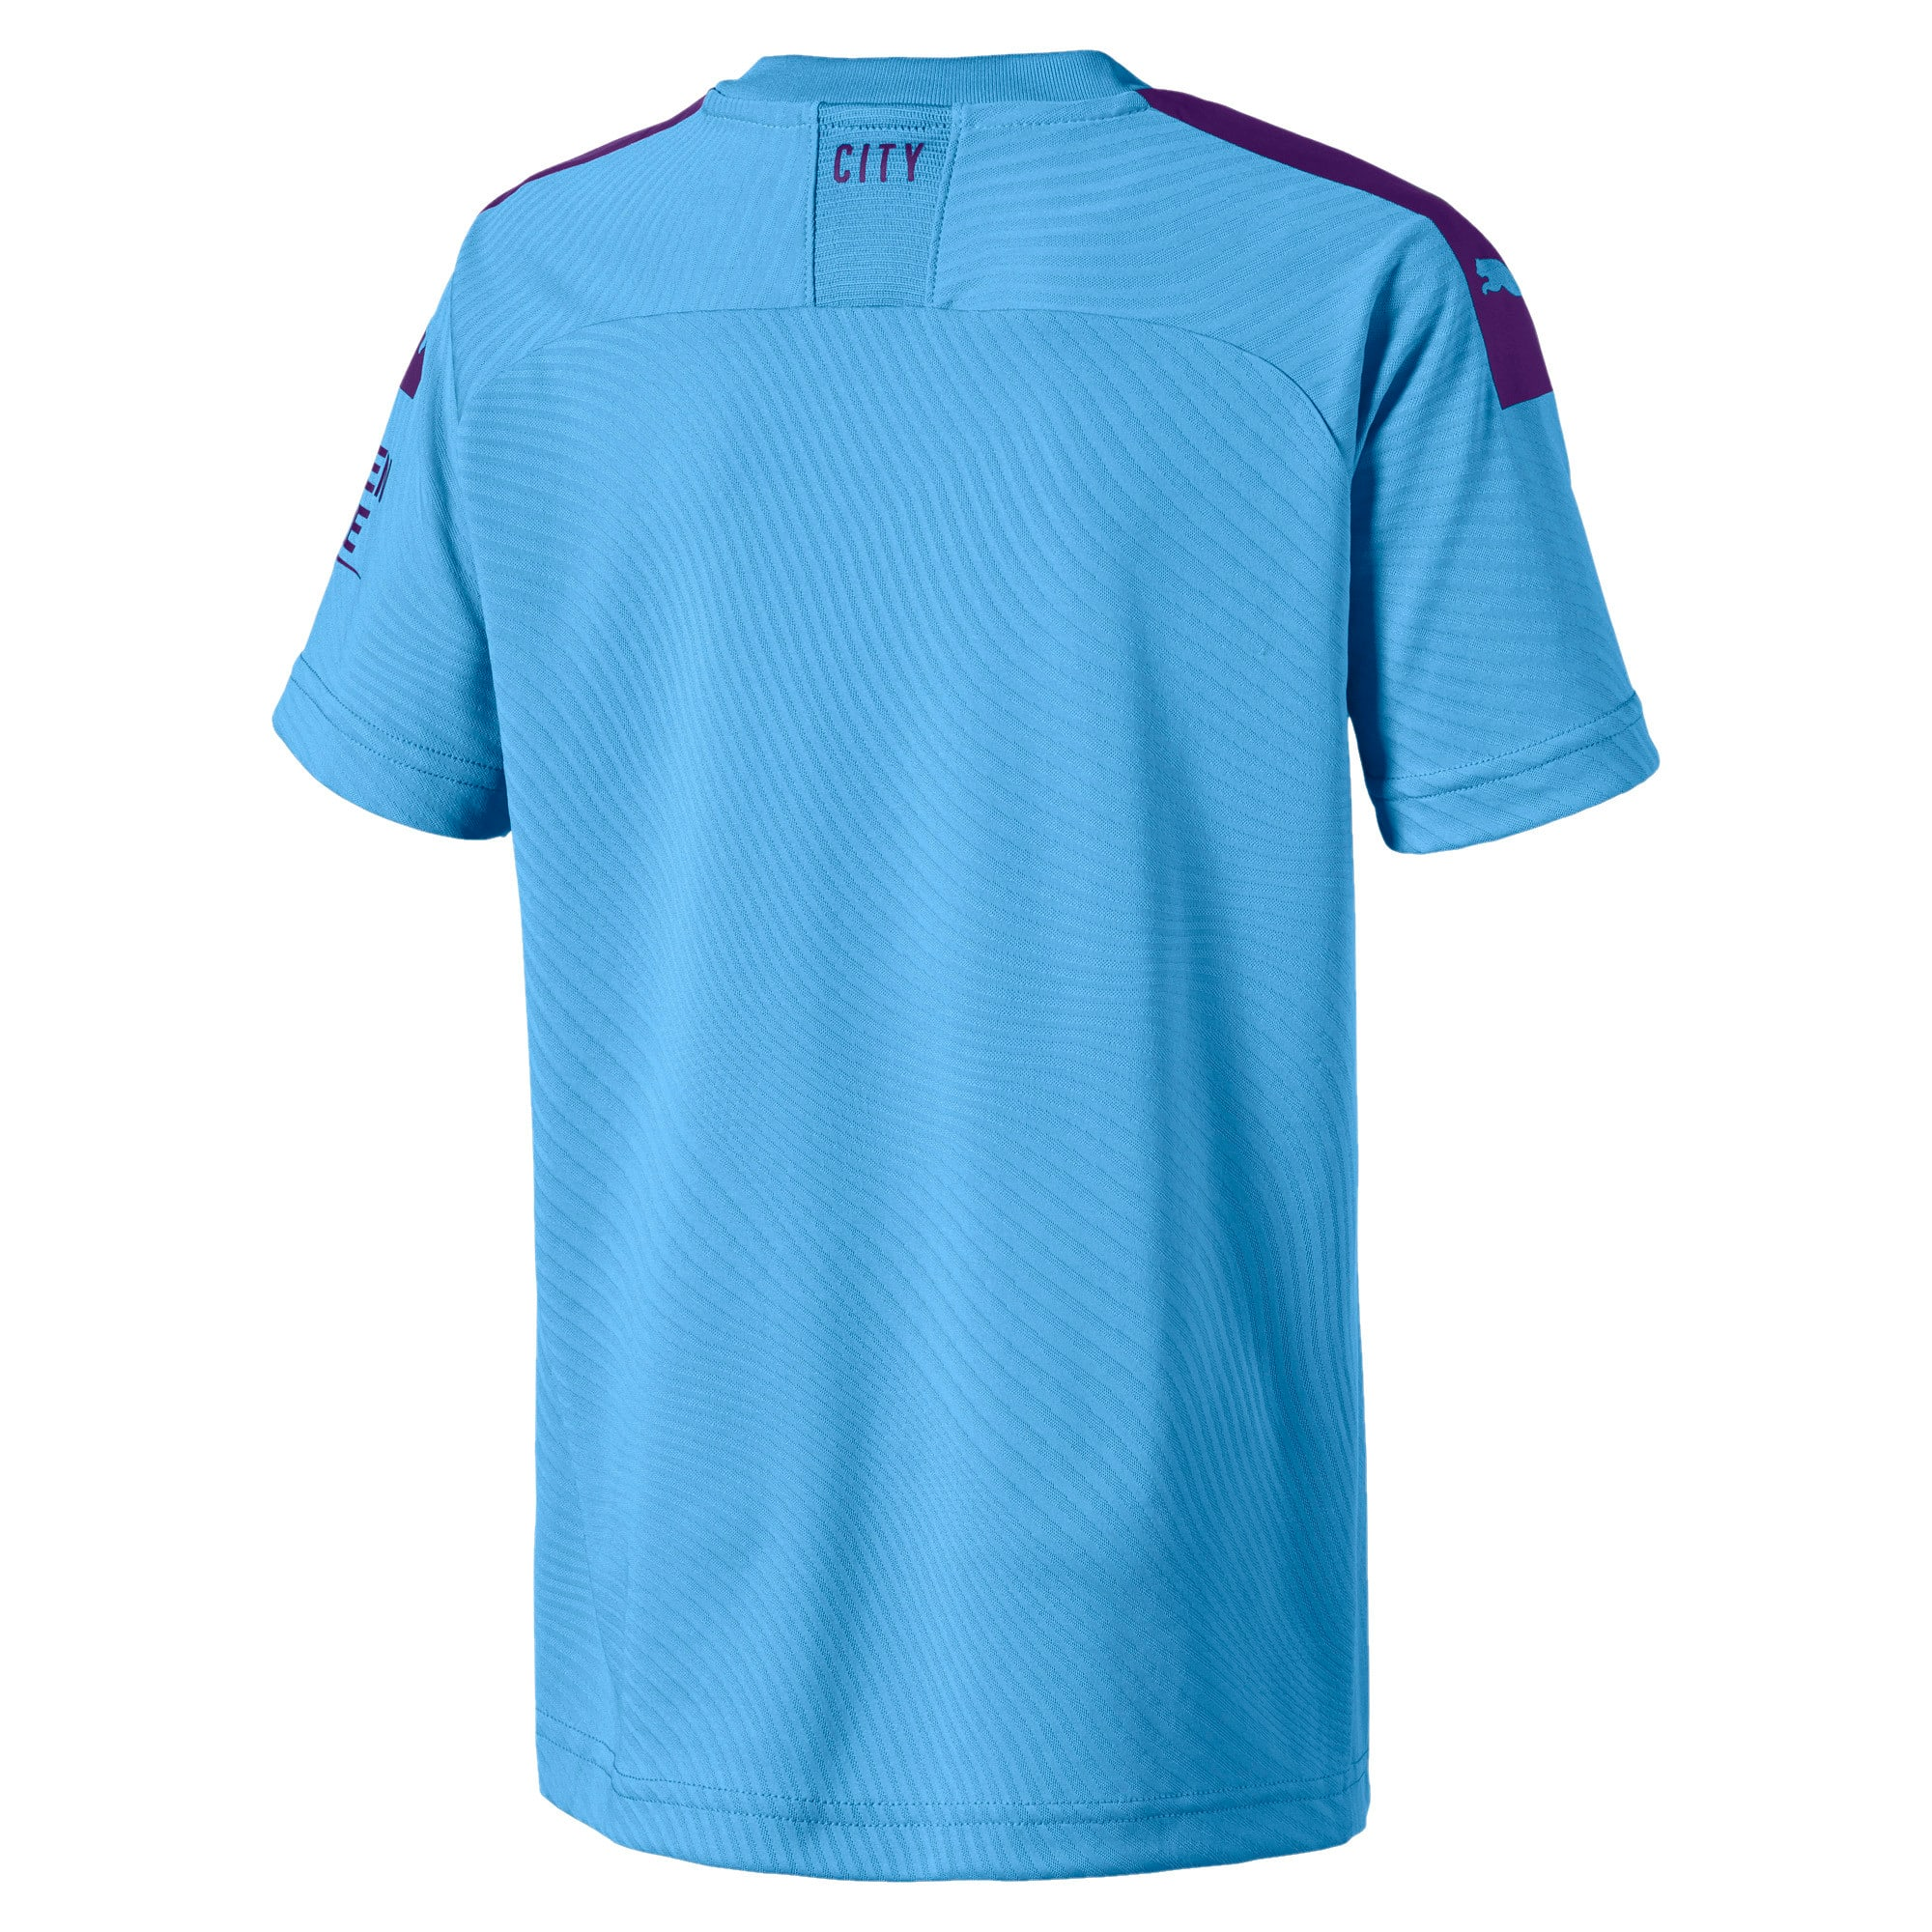 Thumbnail 2 of Camiseta de manga corta de la primera equipación de réplica de niño Man City, TeamLightBlue-TillandsiaPurp, medium